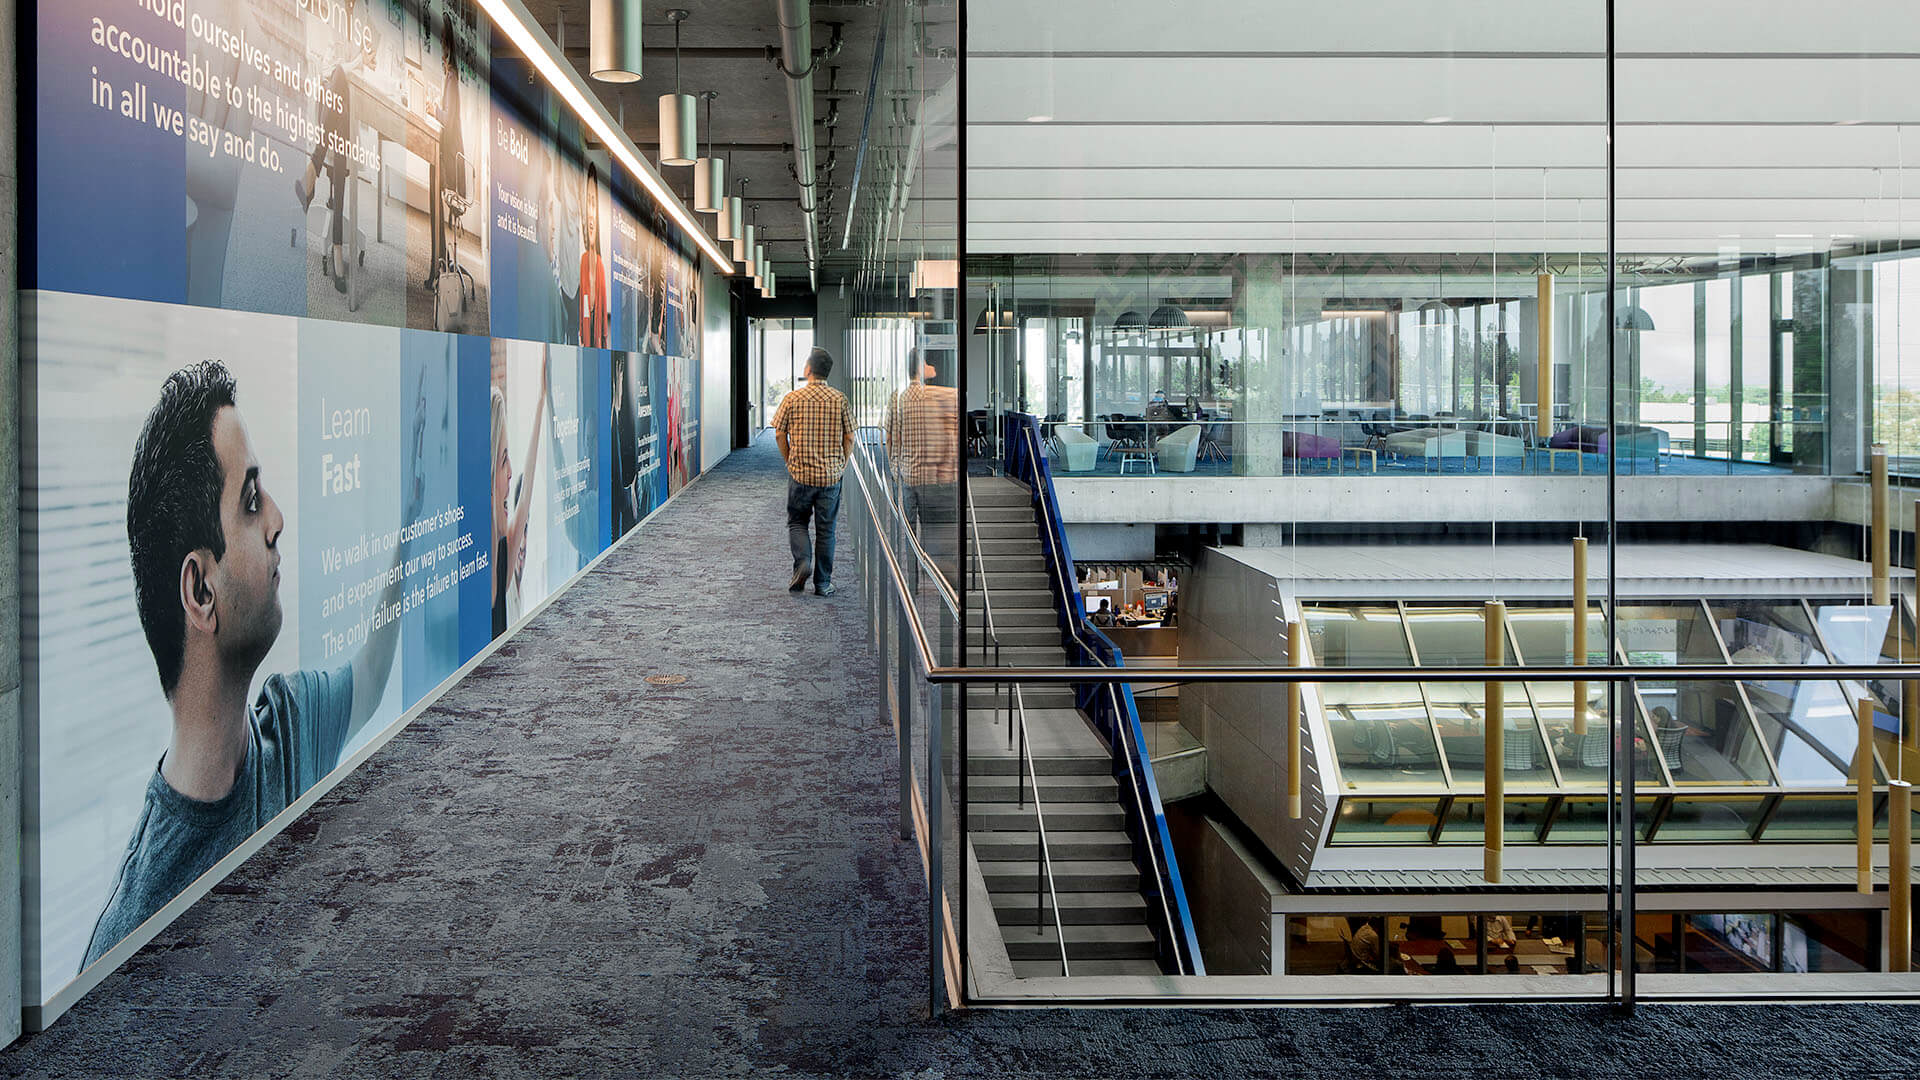 Employee walking through the hallway